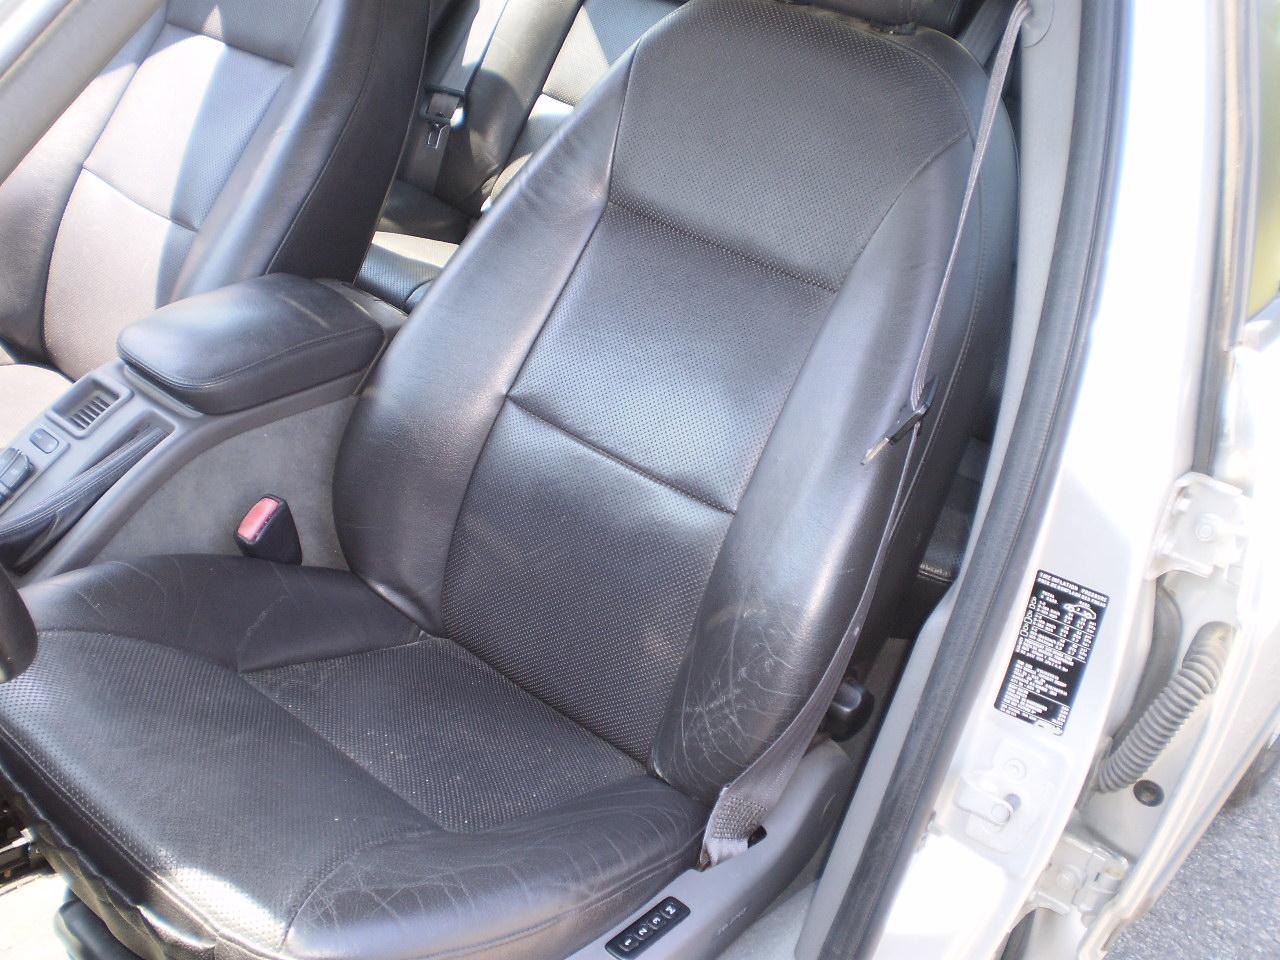 Driver Side Seat 2003 SAAB 9-5 Wagon